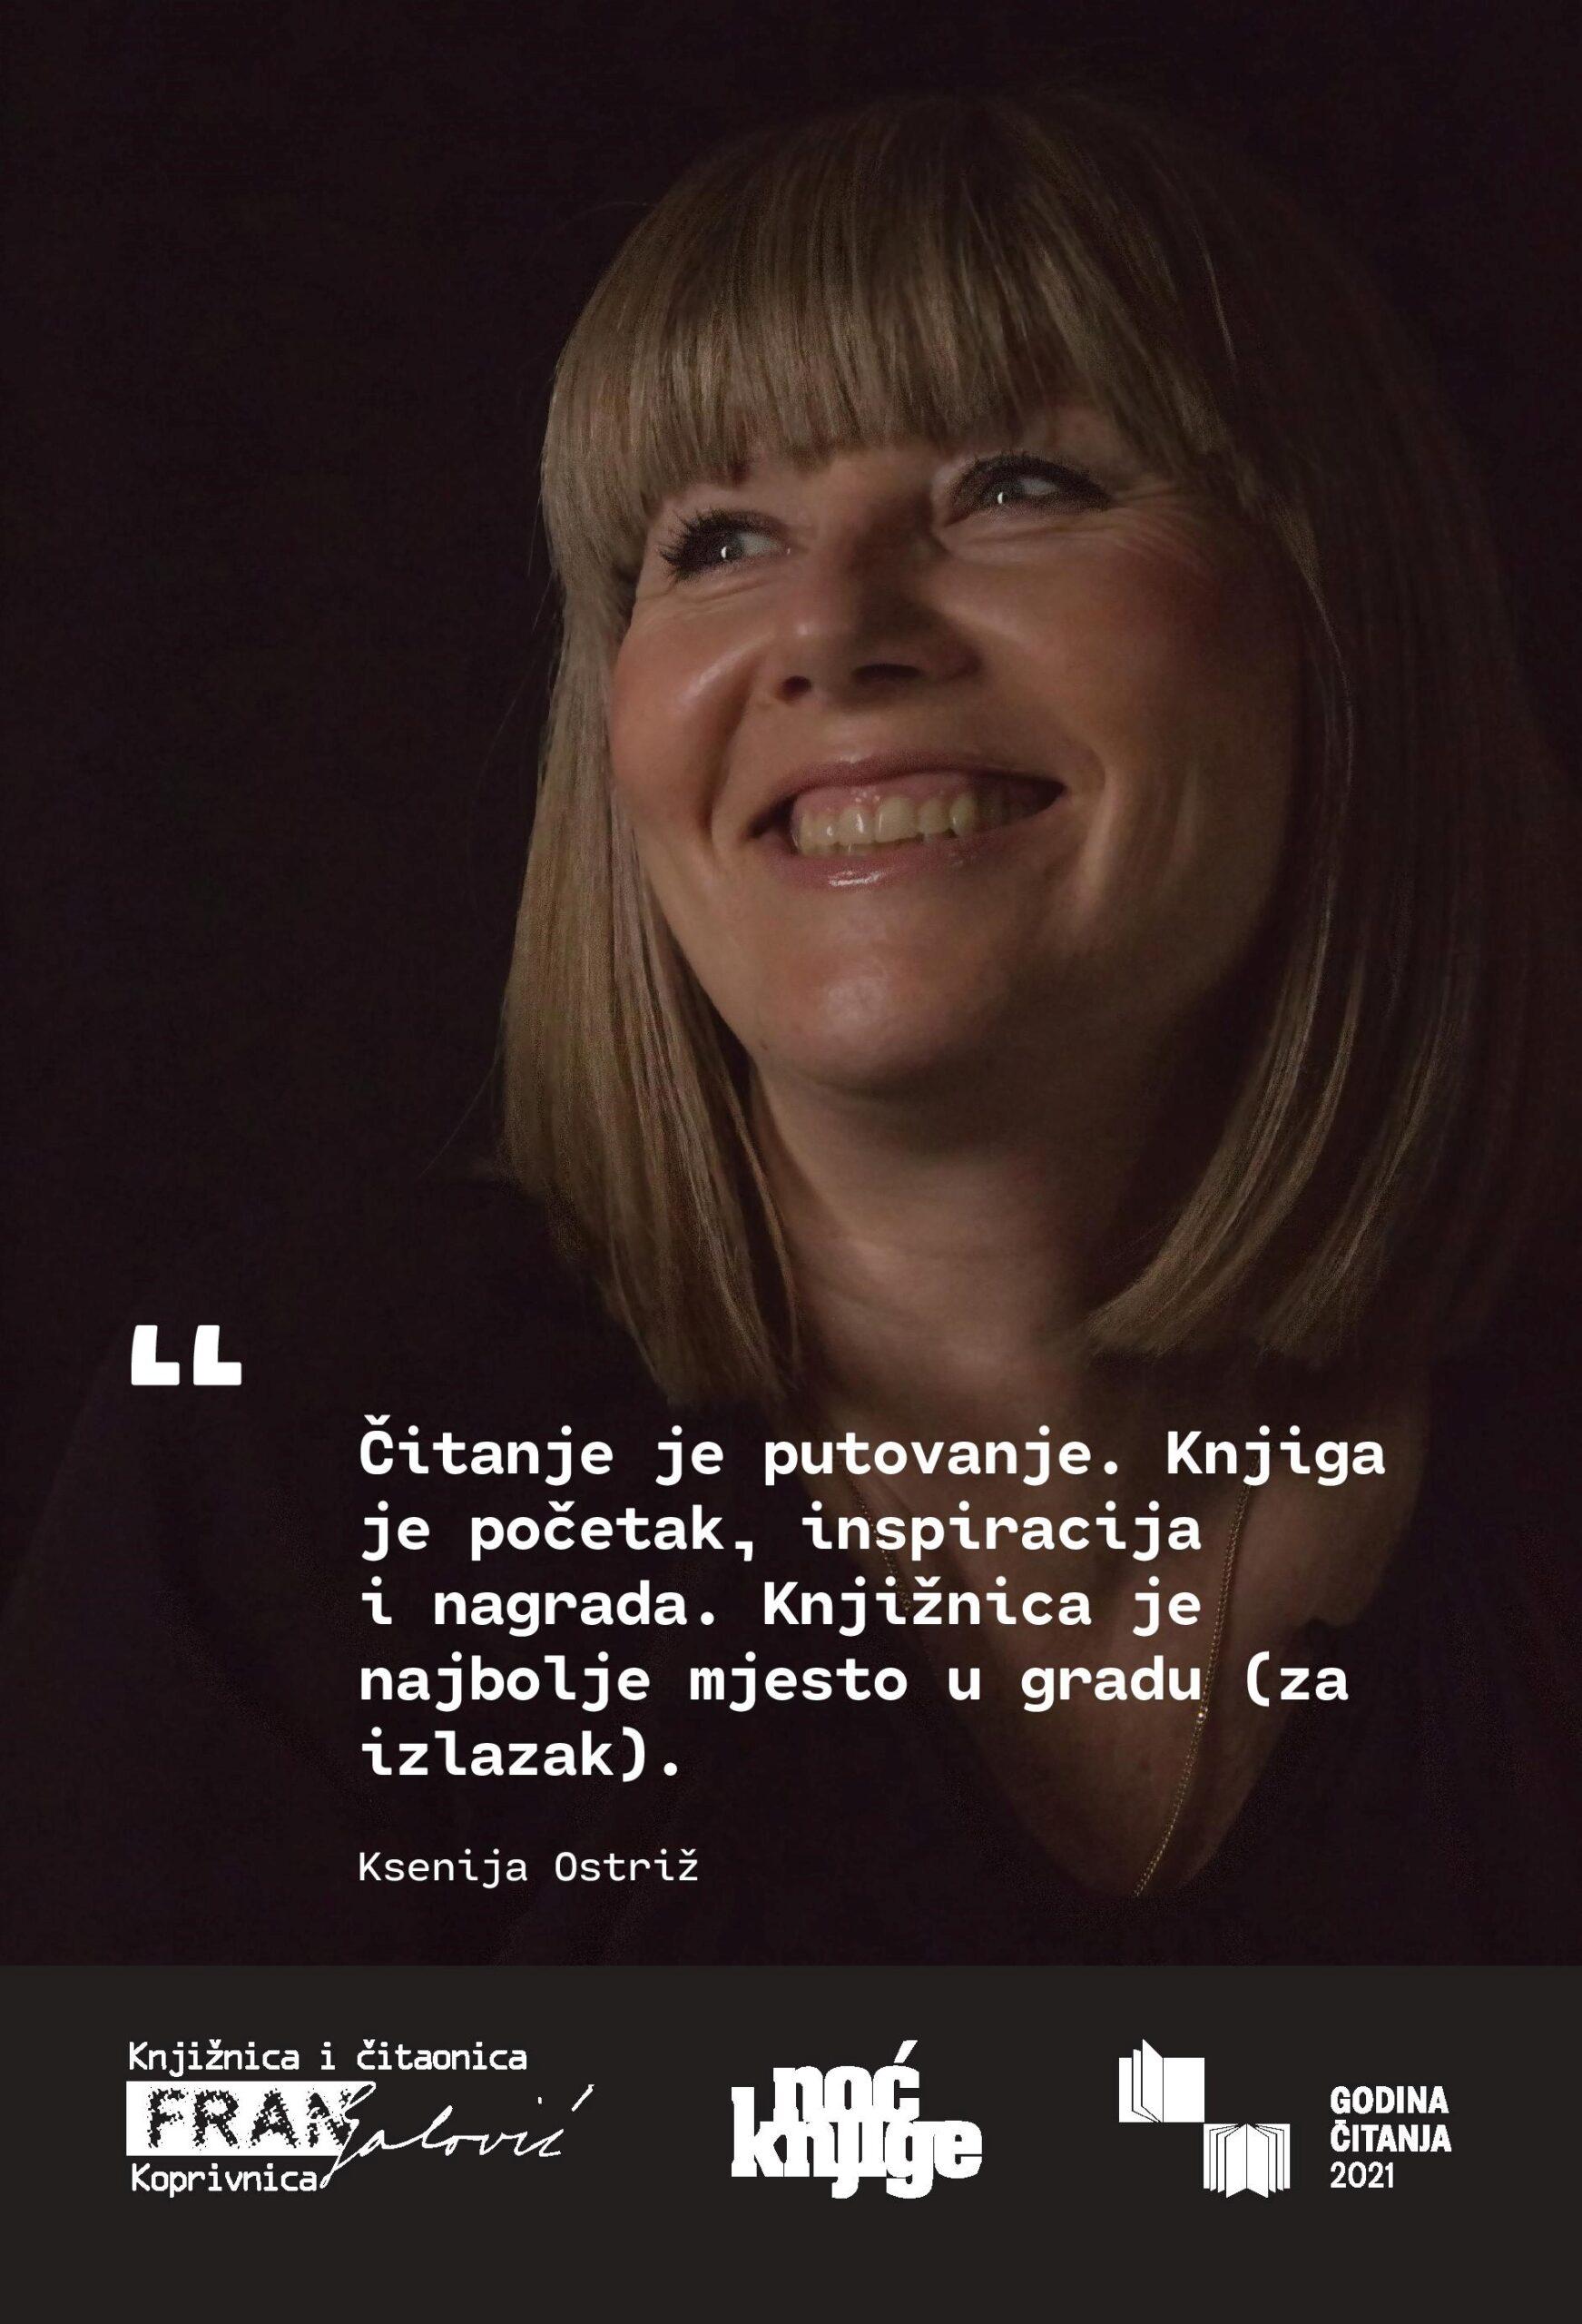 Ksenija Ostriž